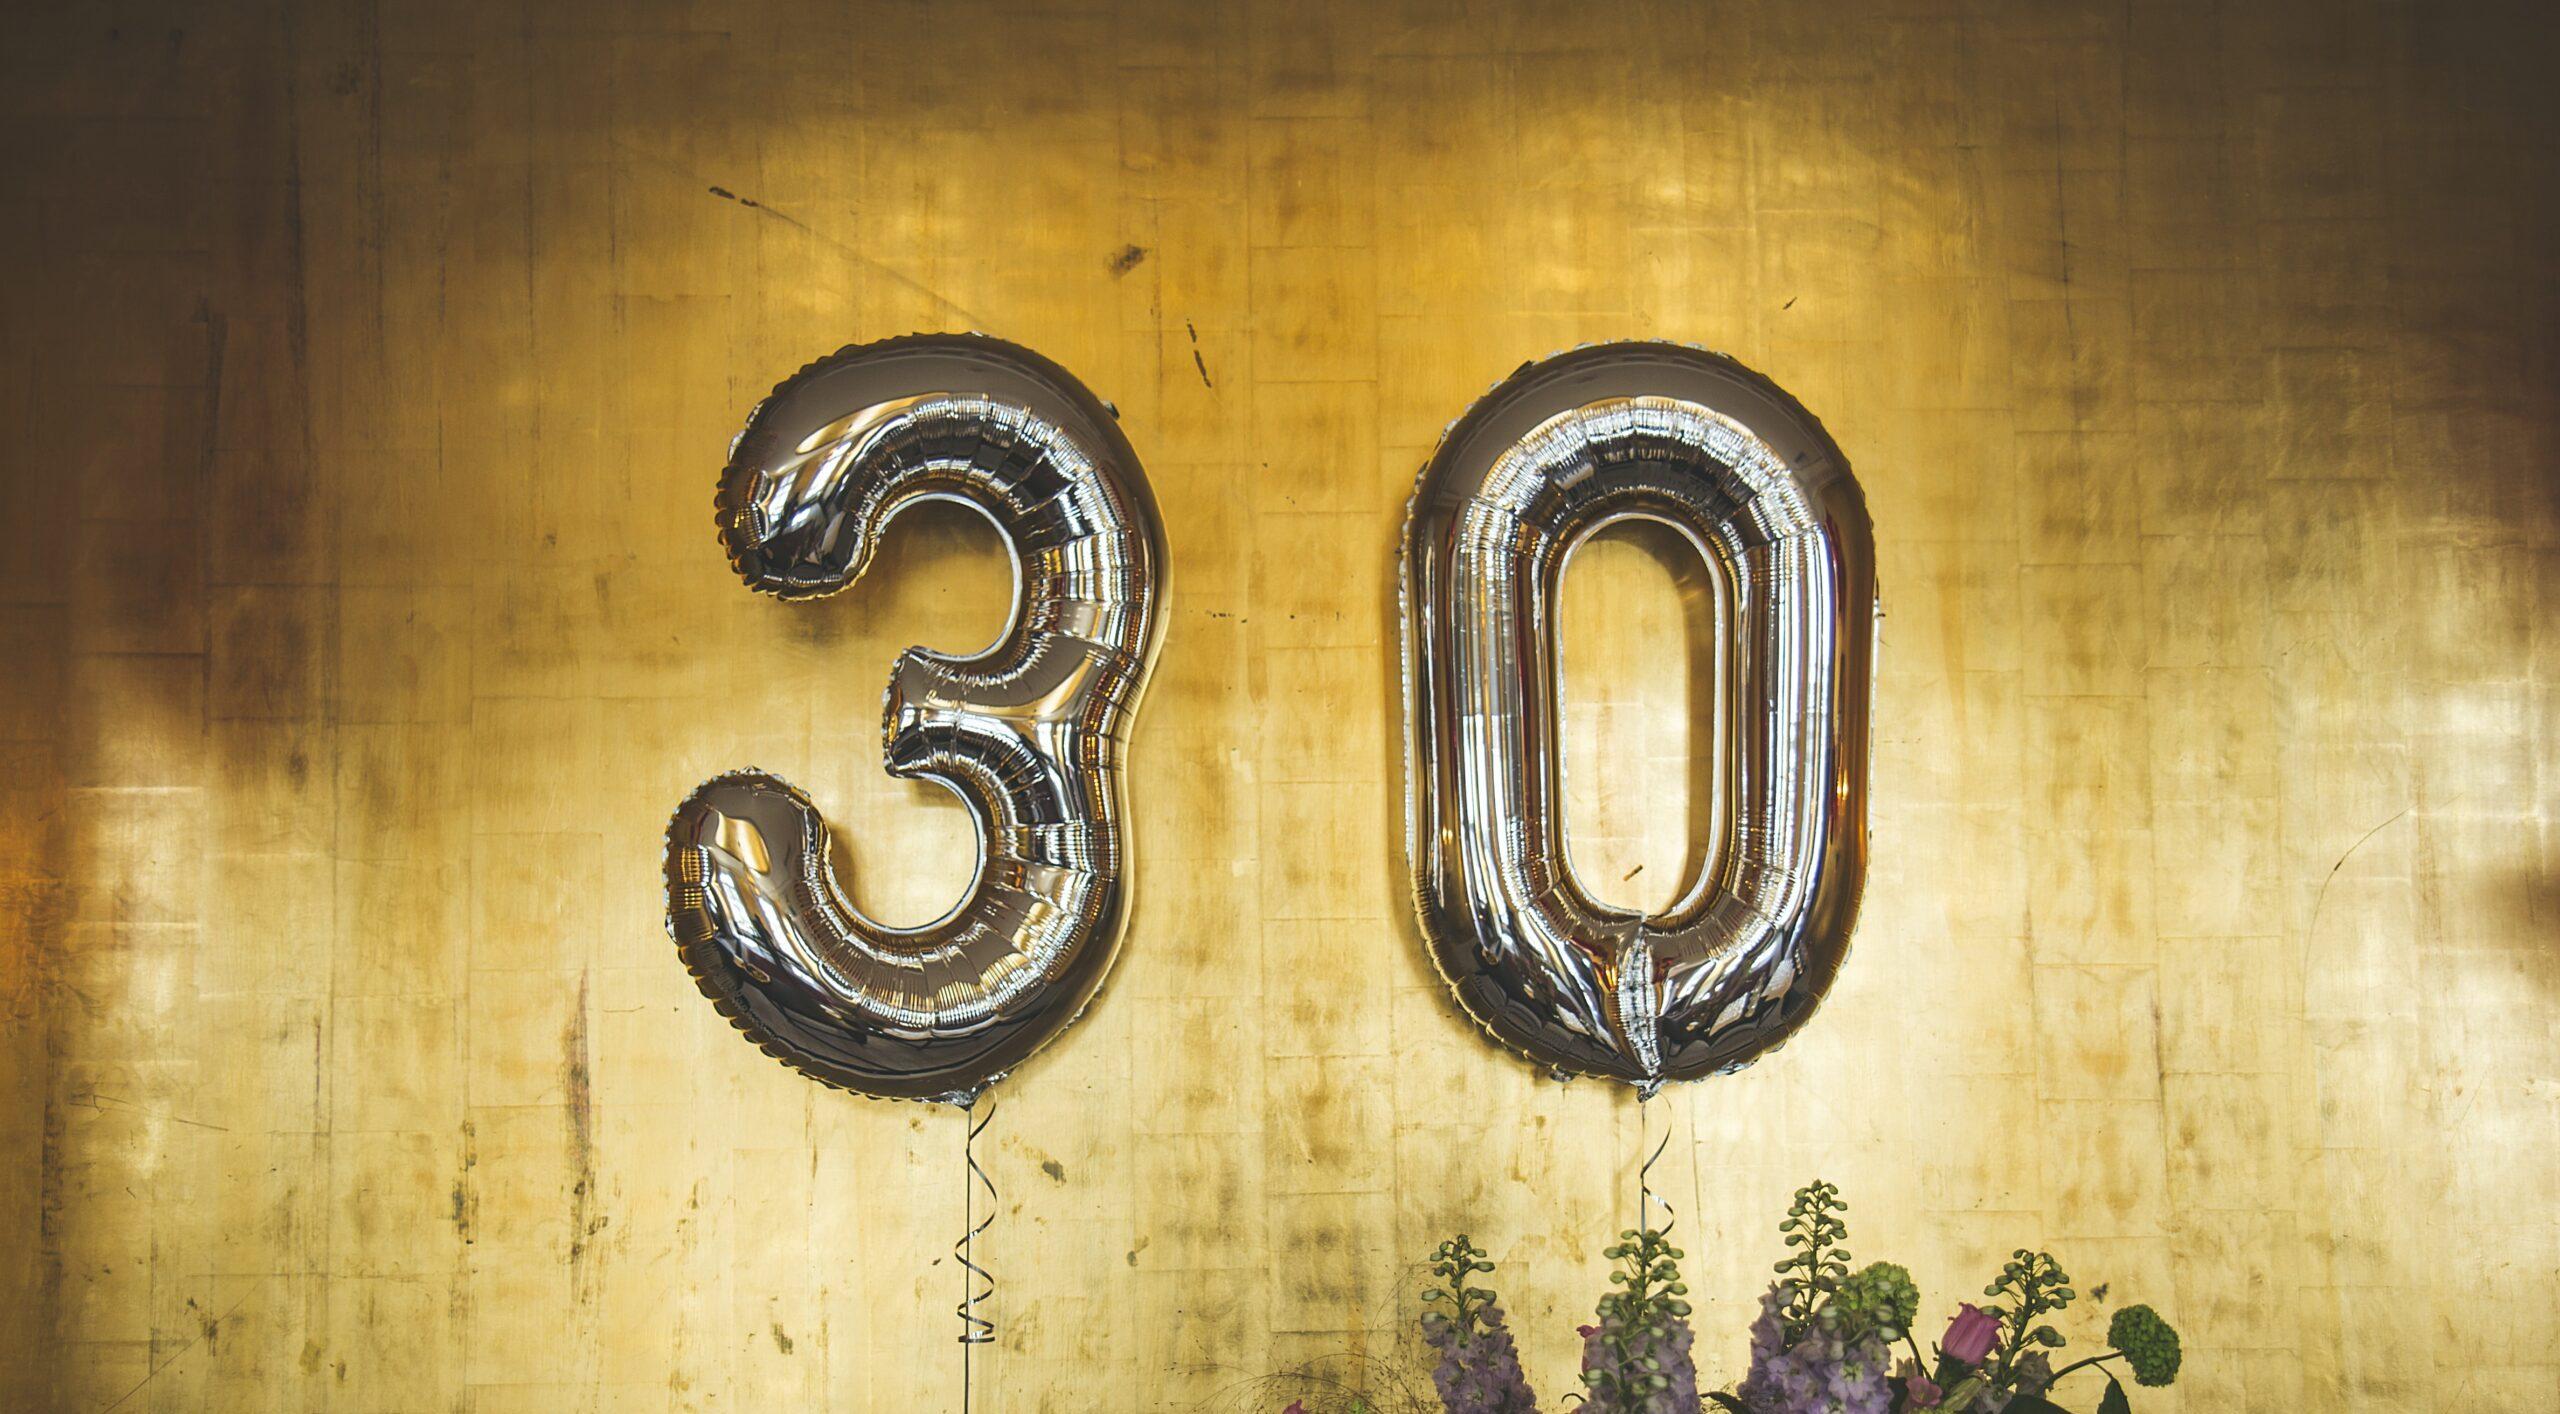 30 days left to register on the EU Settlement Scheme